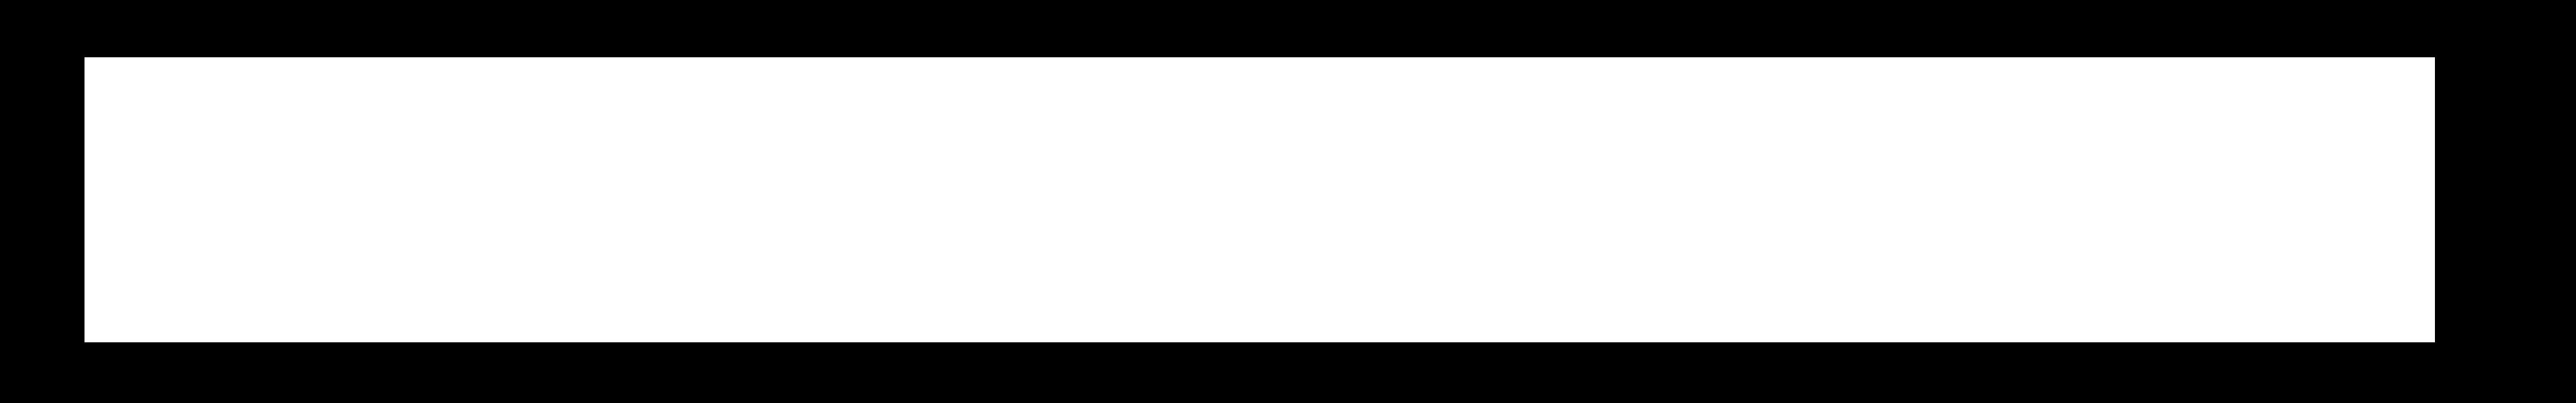 logo Navetta 64